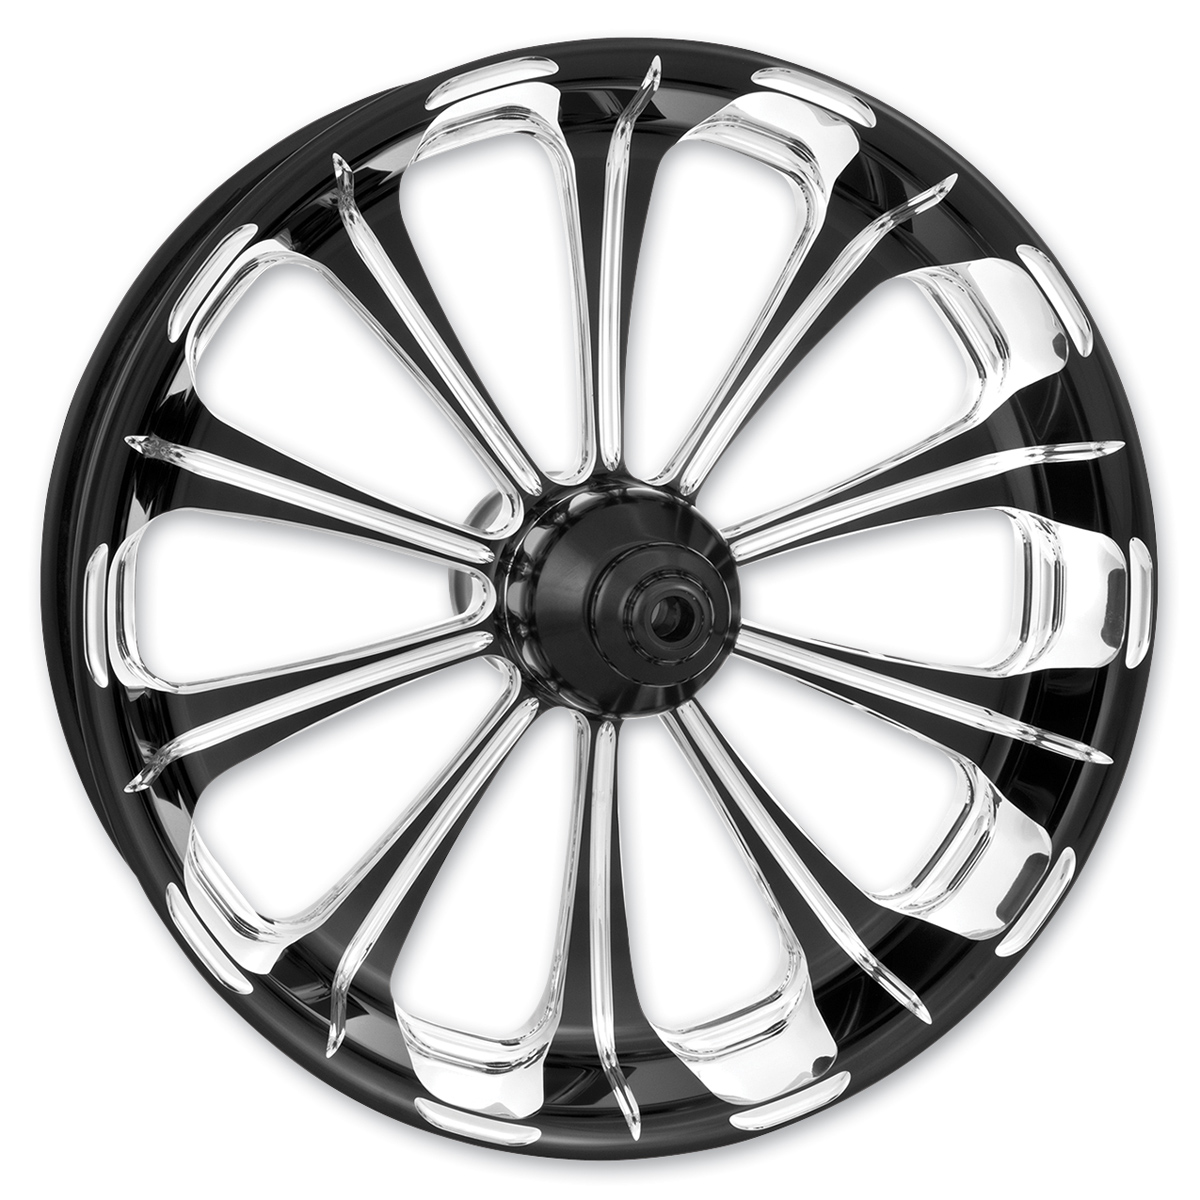 Performance Machine Revel Platinum Cut Front Wheel 21x3.5 ABS